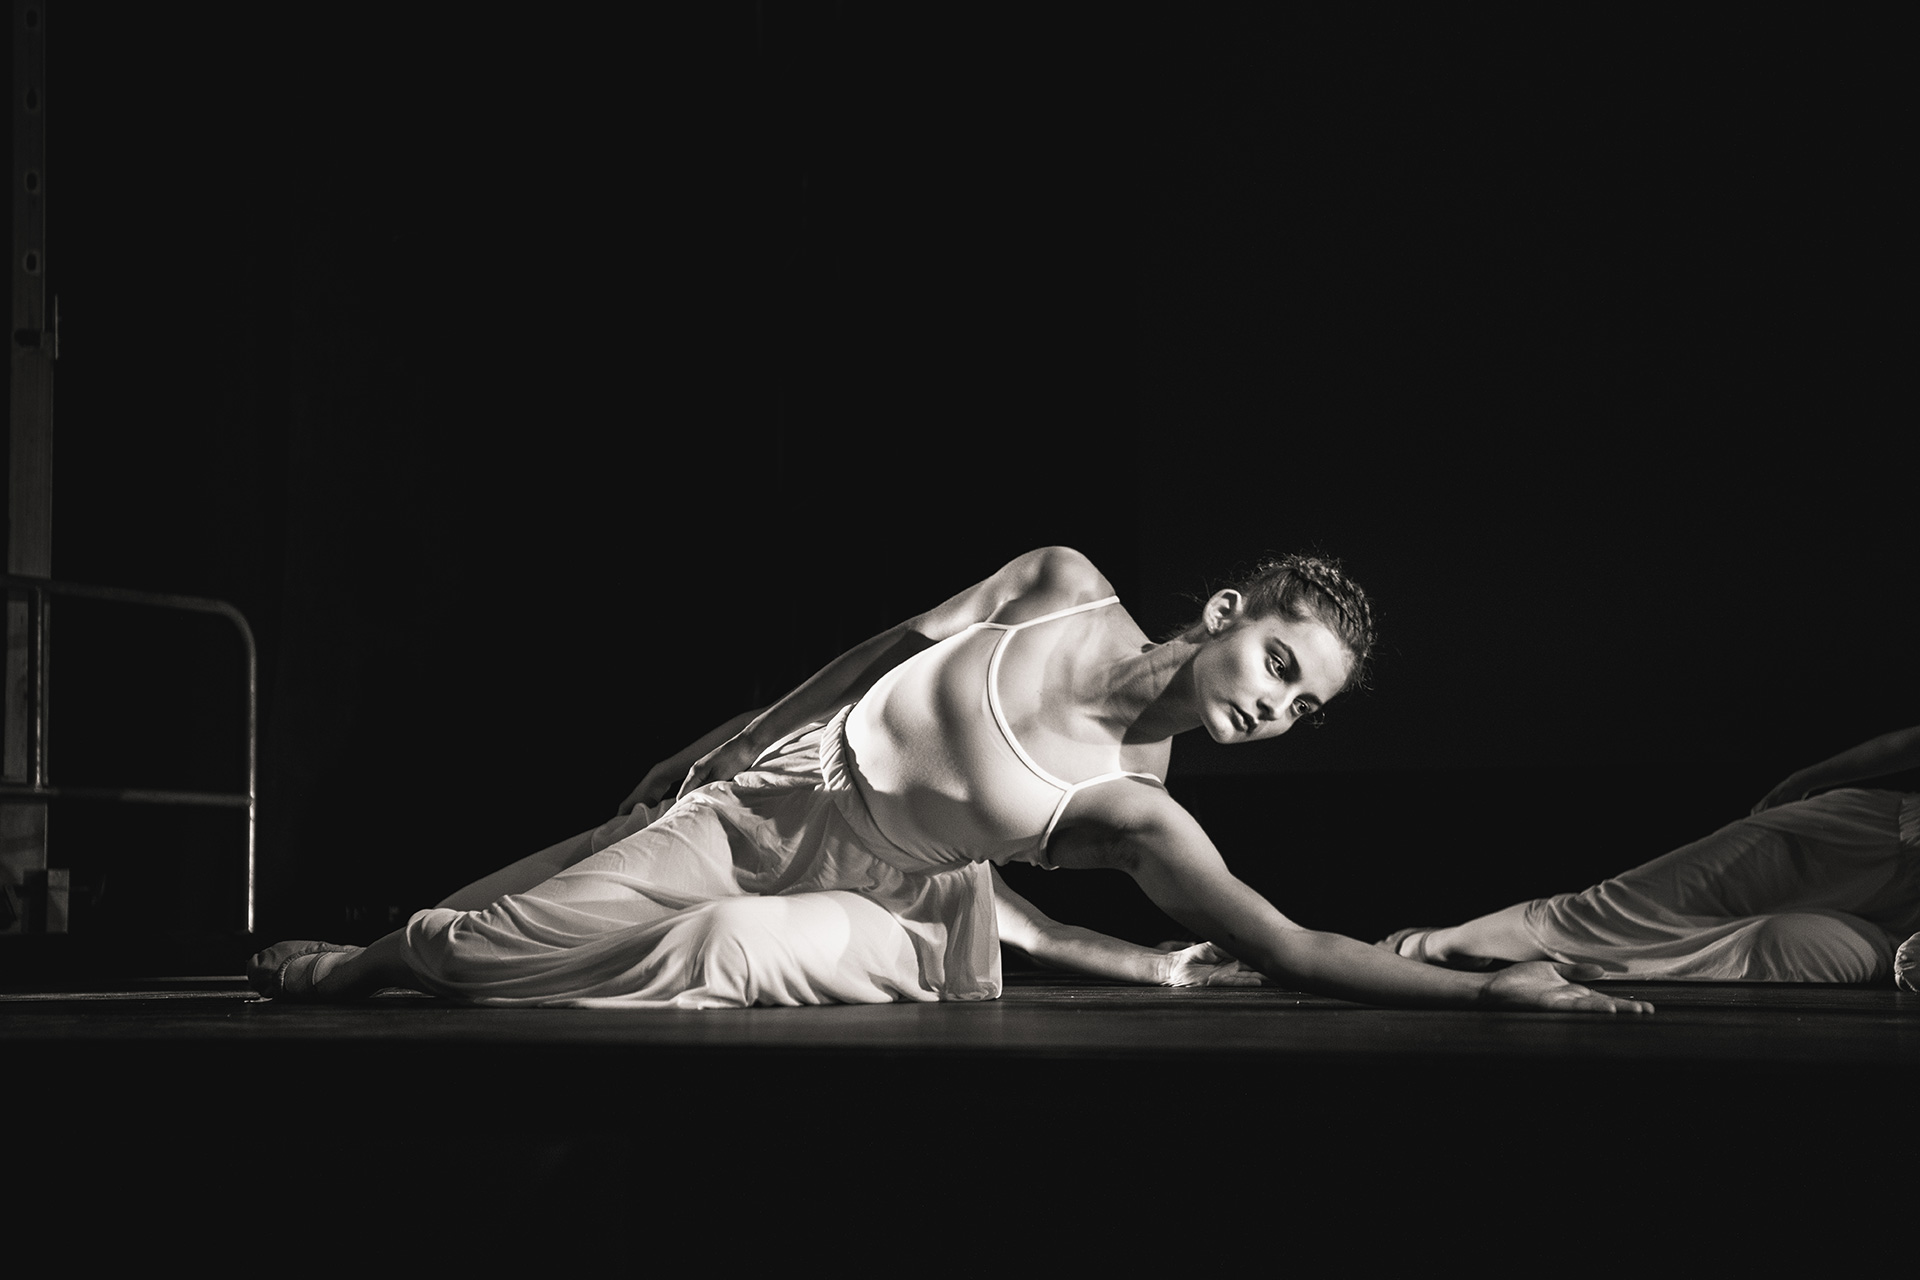 Ballett-by-SilvanGiger-78.jpg